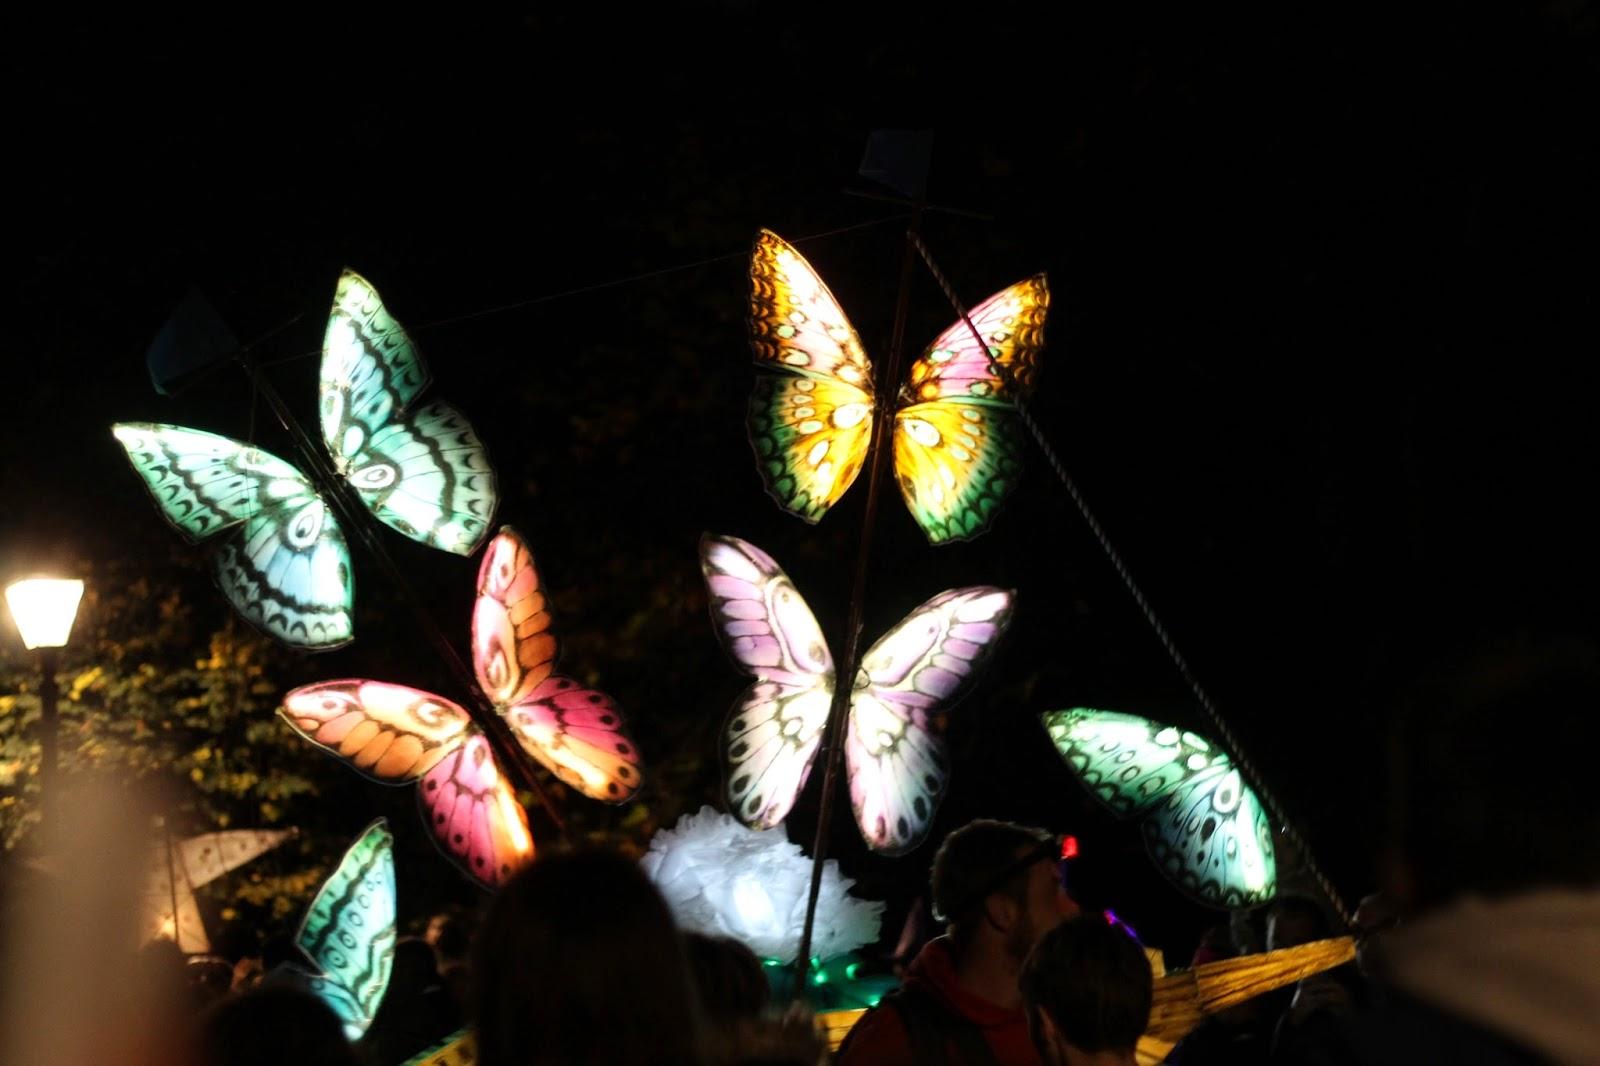 Liverpool Lantern Parade